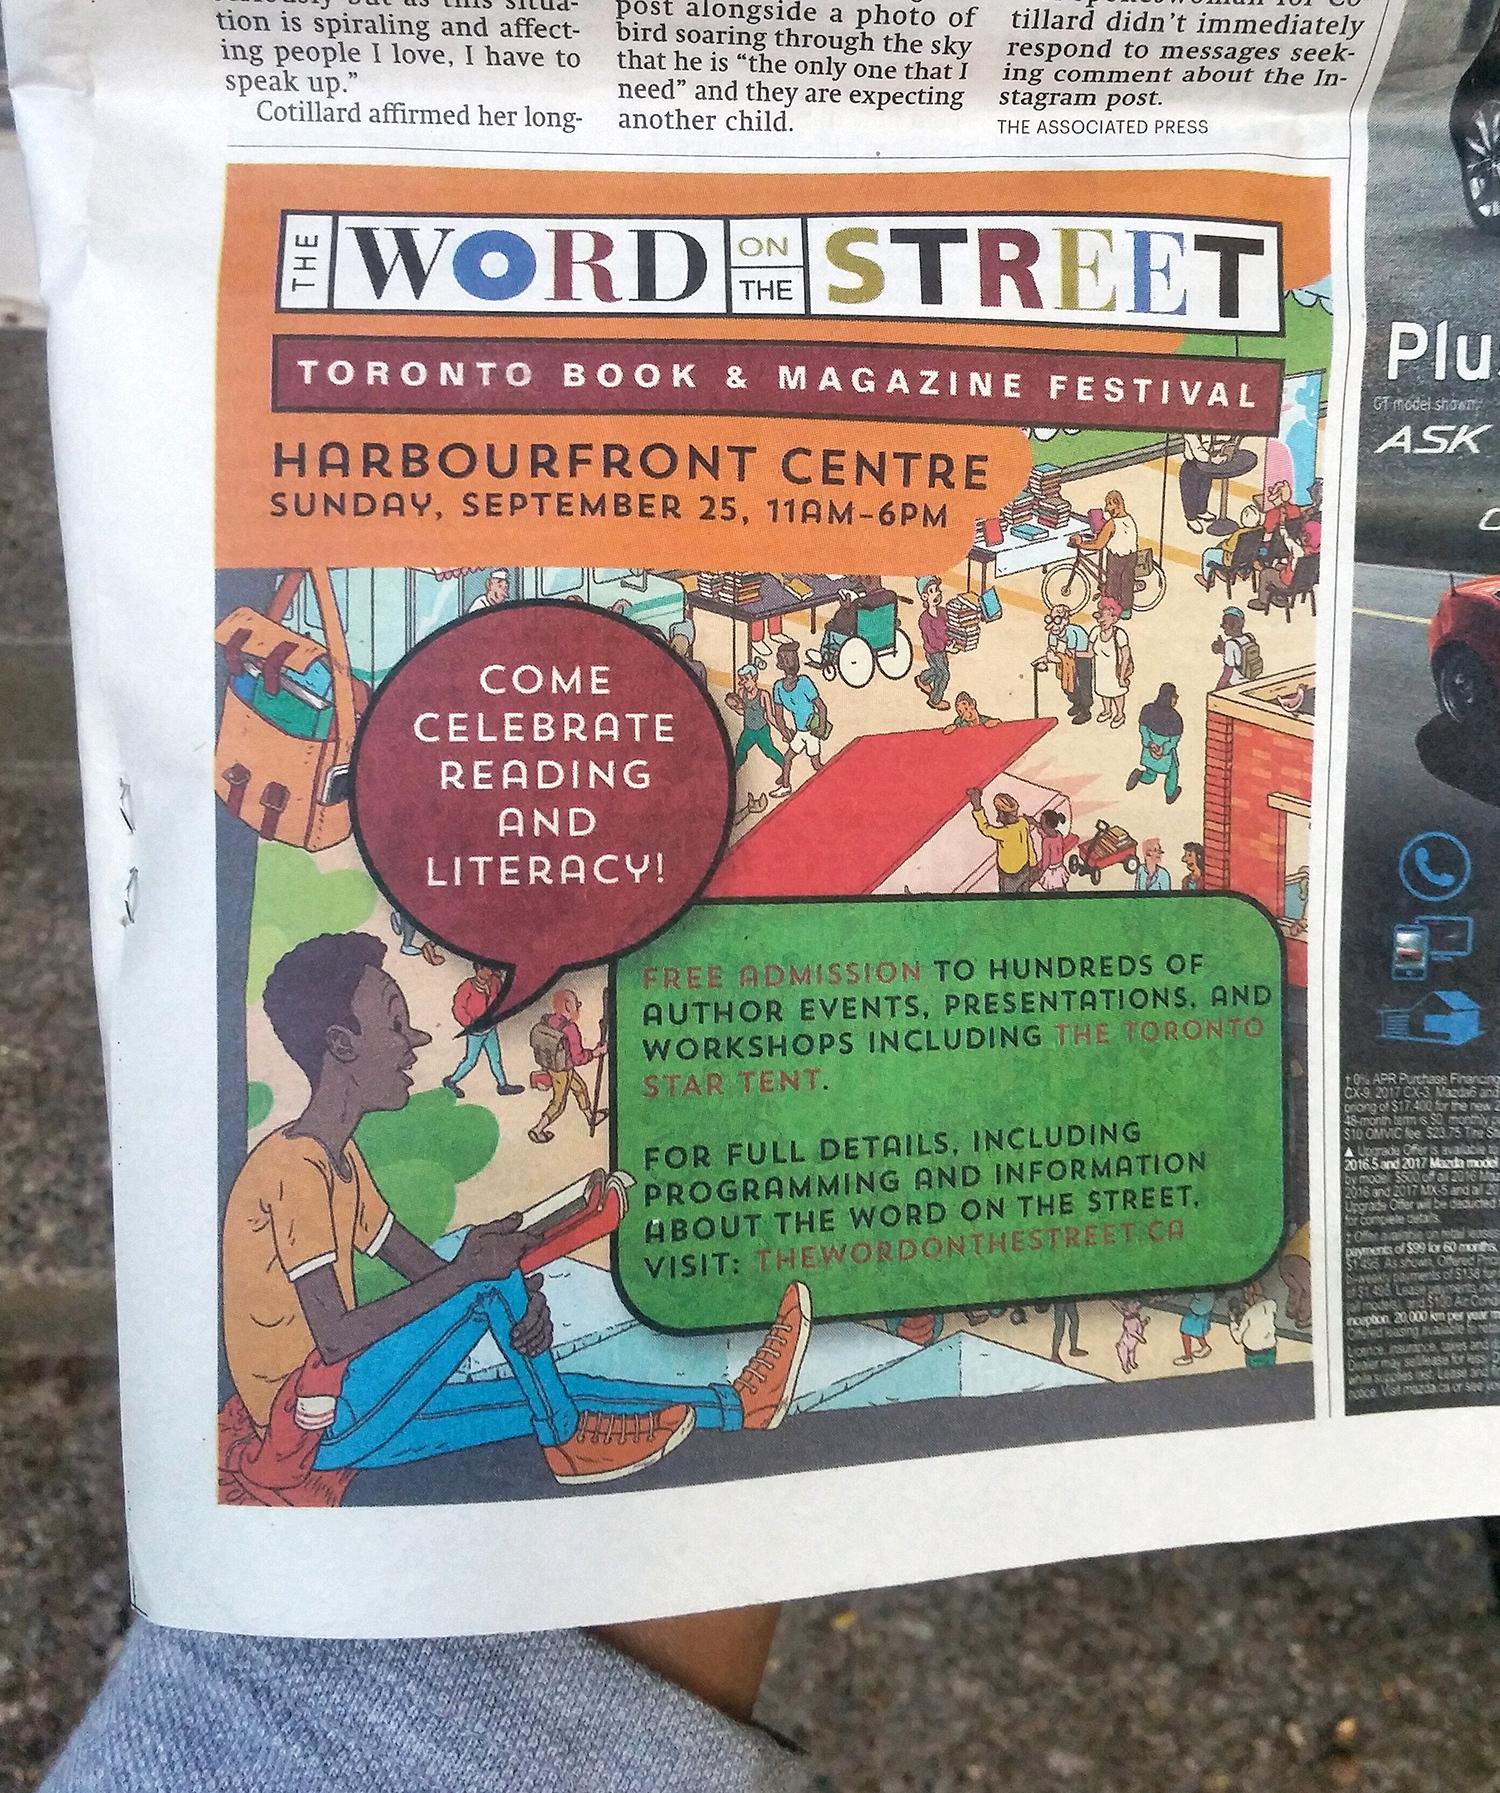 Local newspaper ad